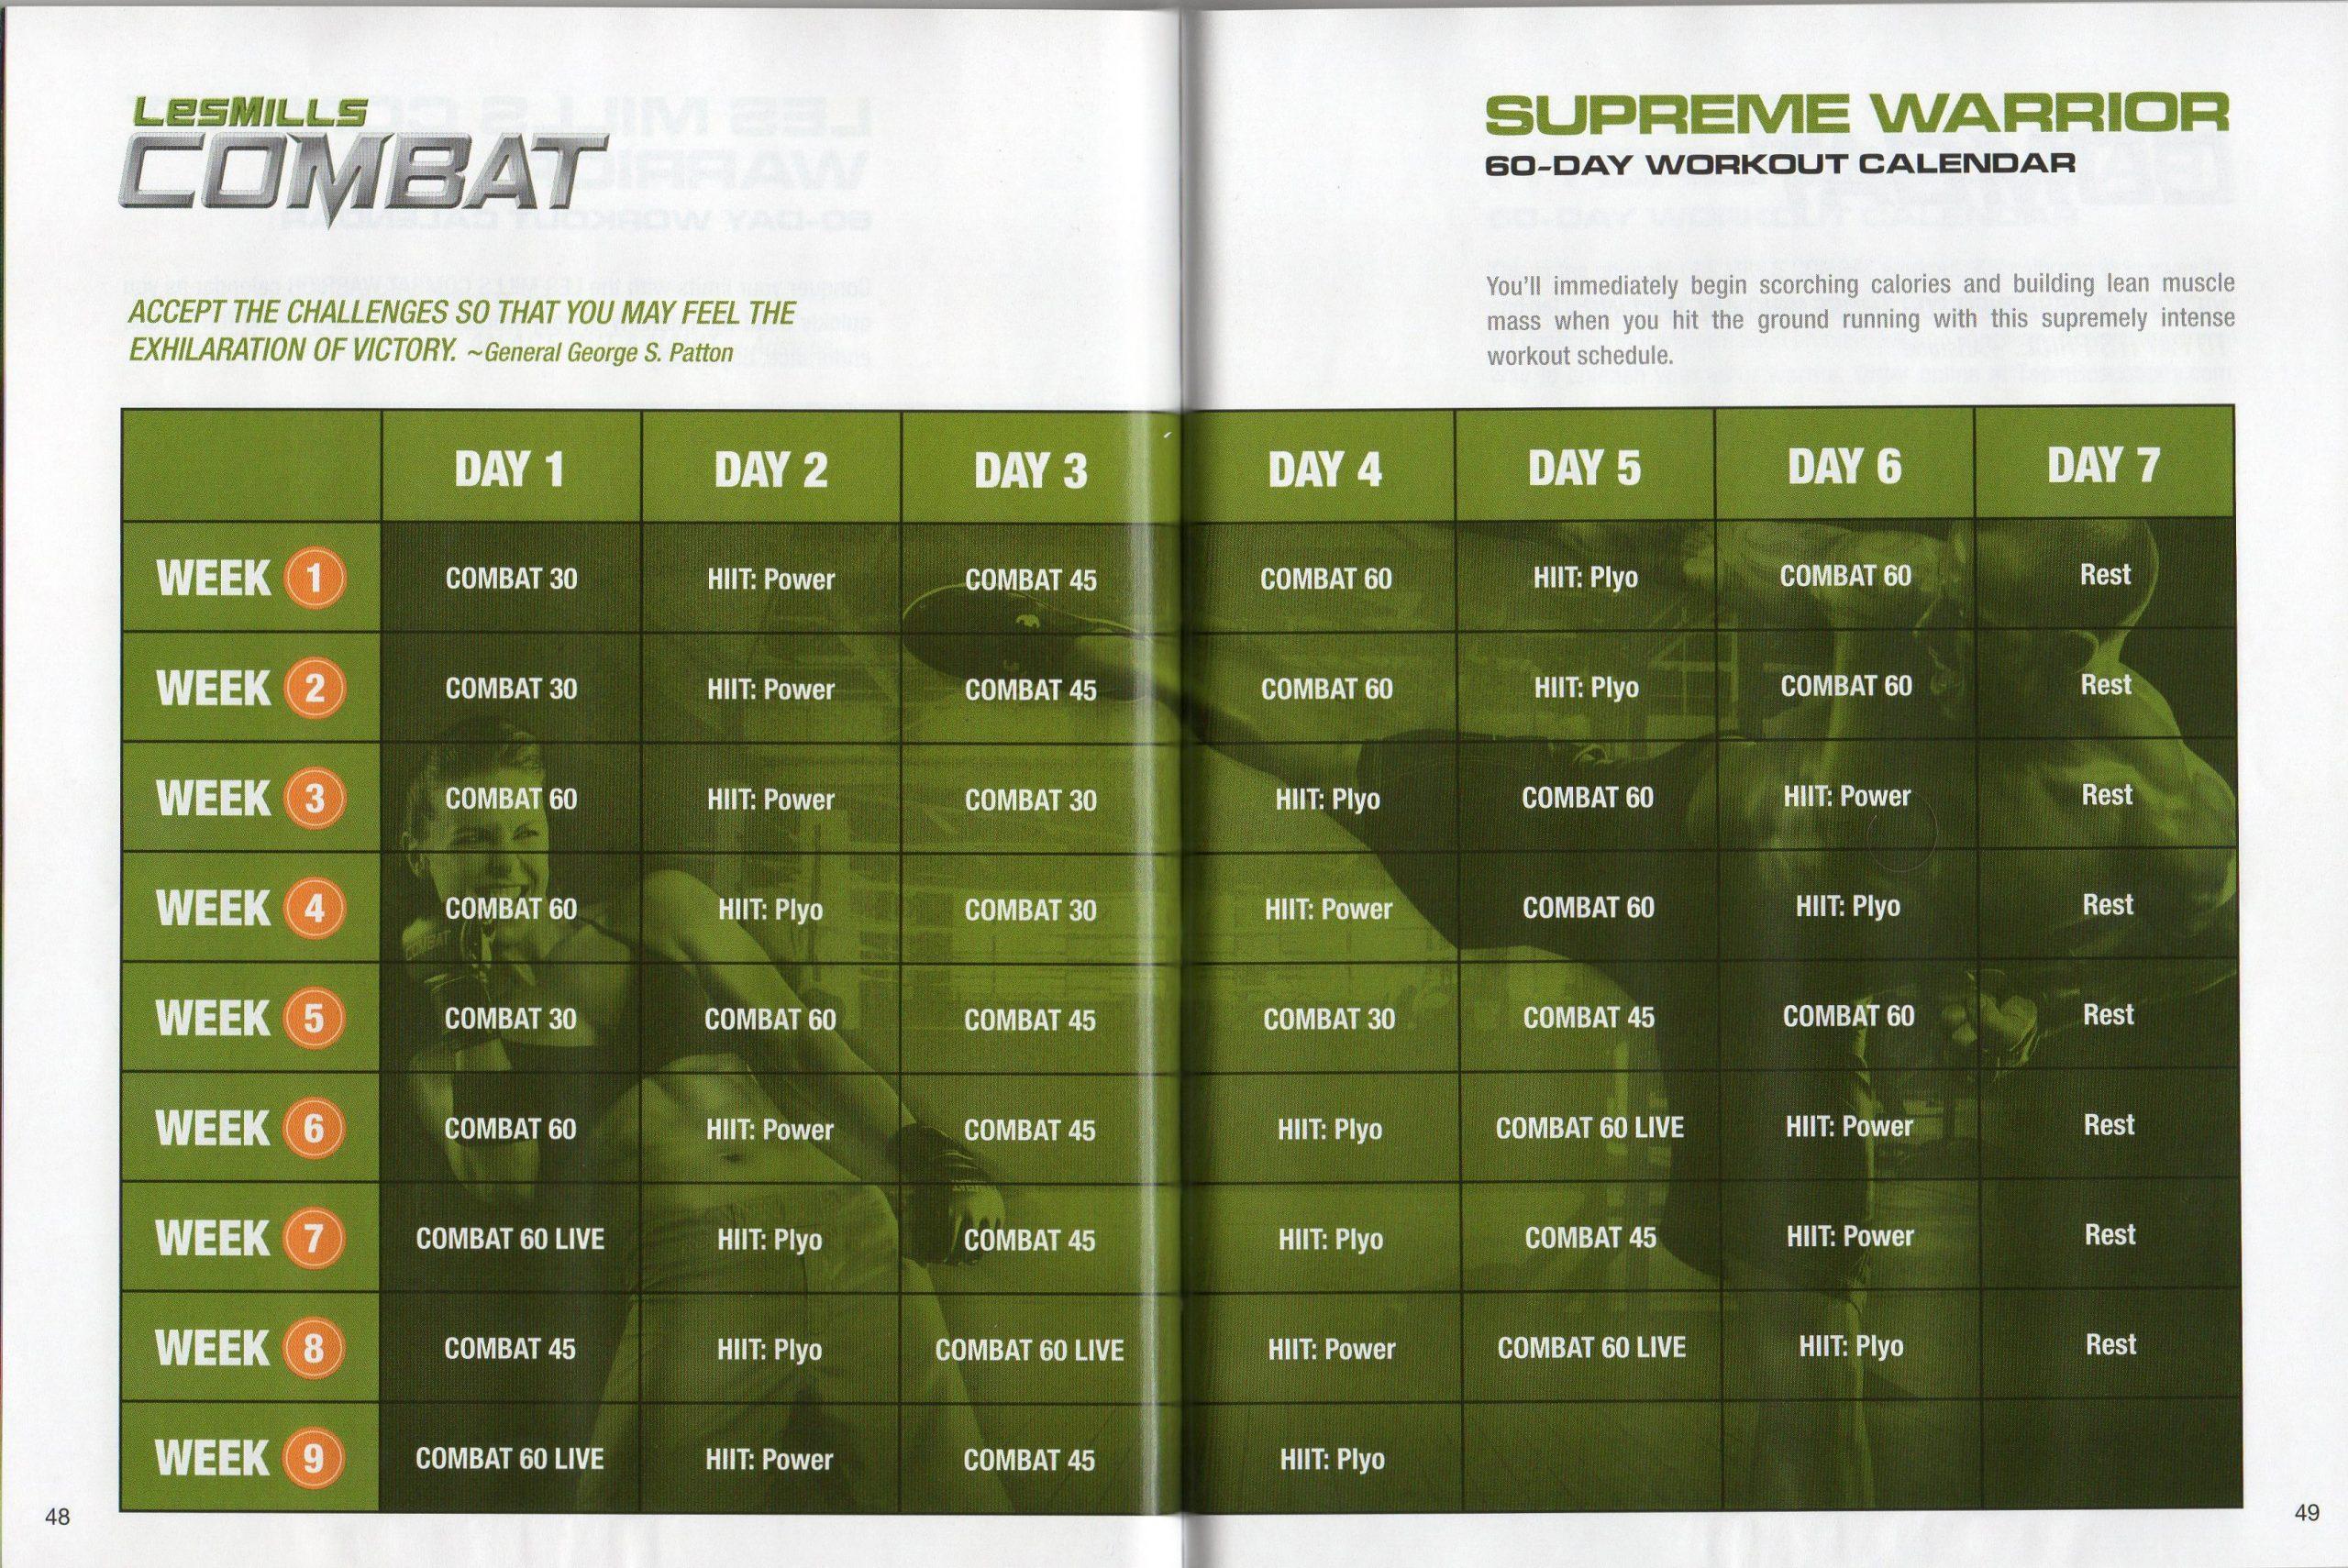 Les Mills Combat ~ 02 ~ 60 Day Supreme Warrior Calendar Regarding Supreme 90 Day Schedule